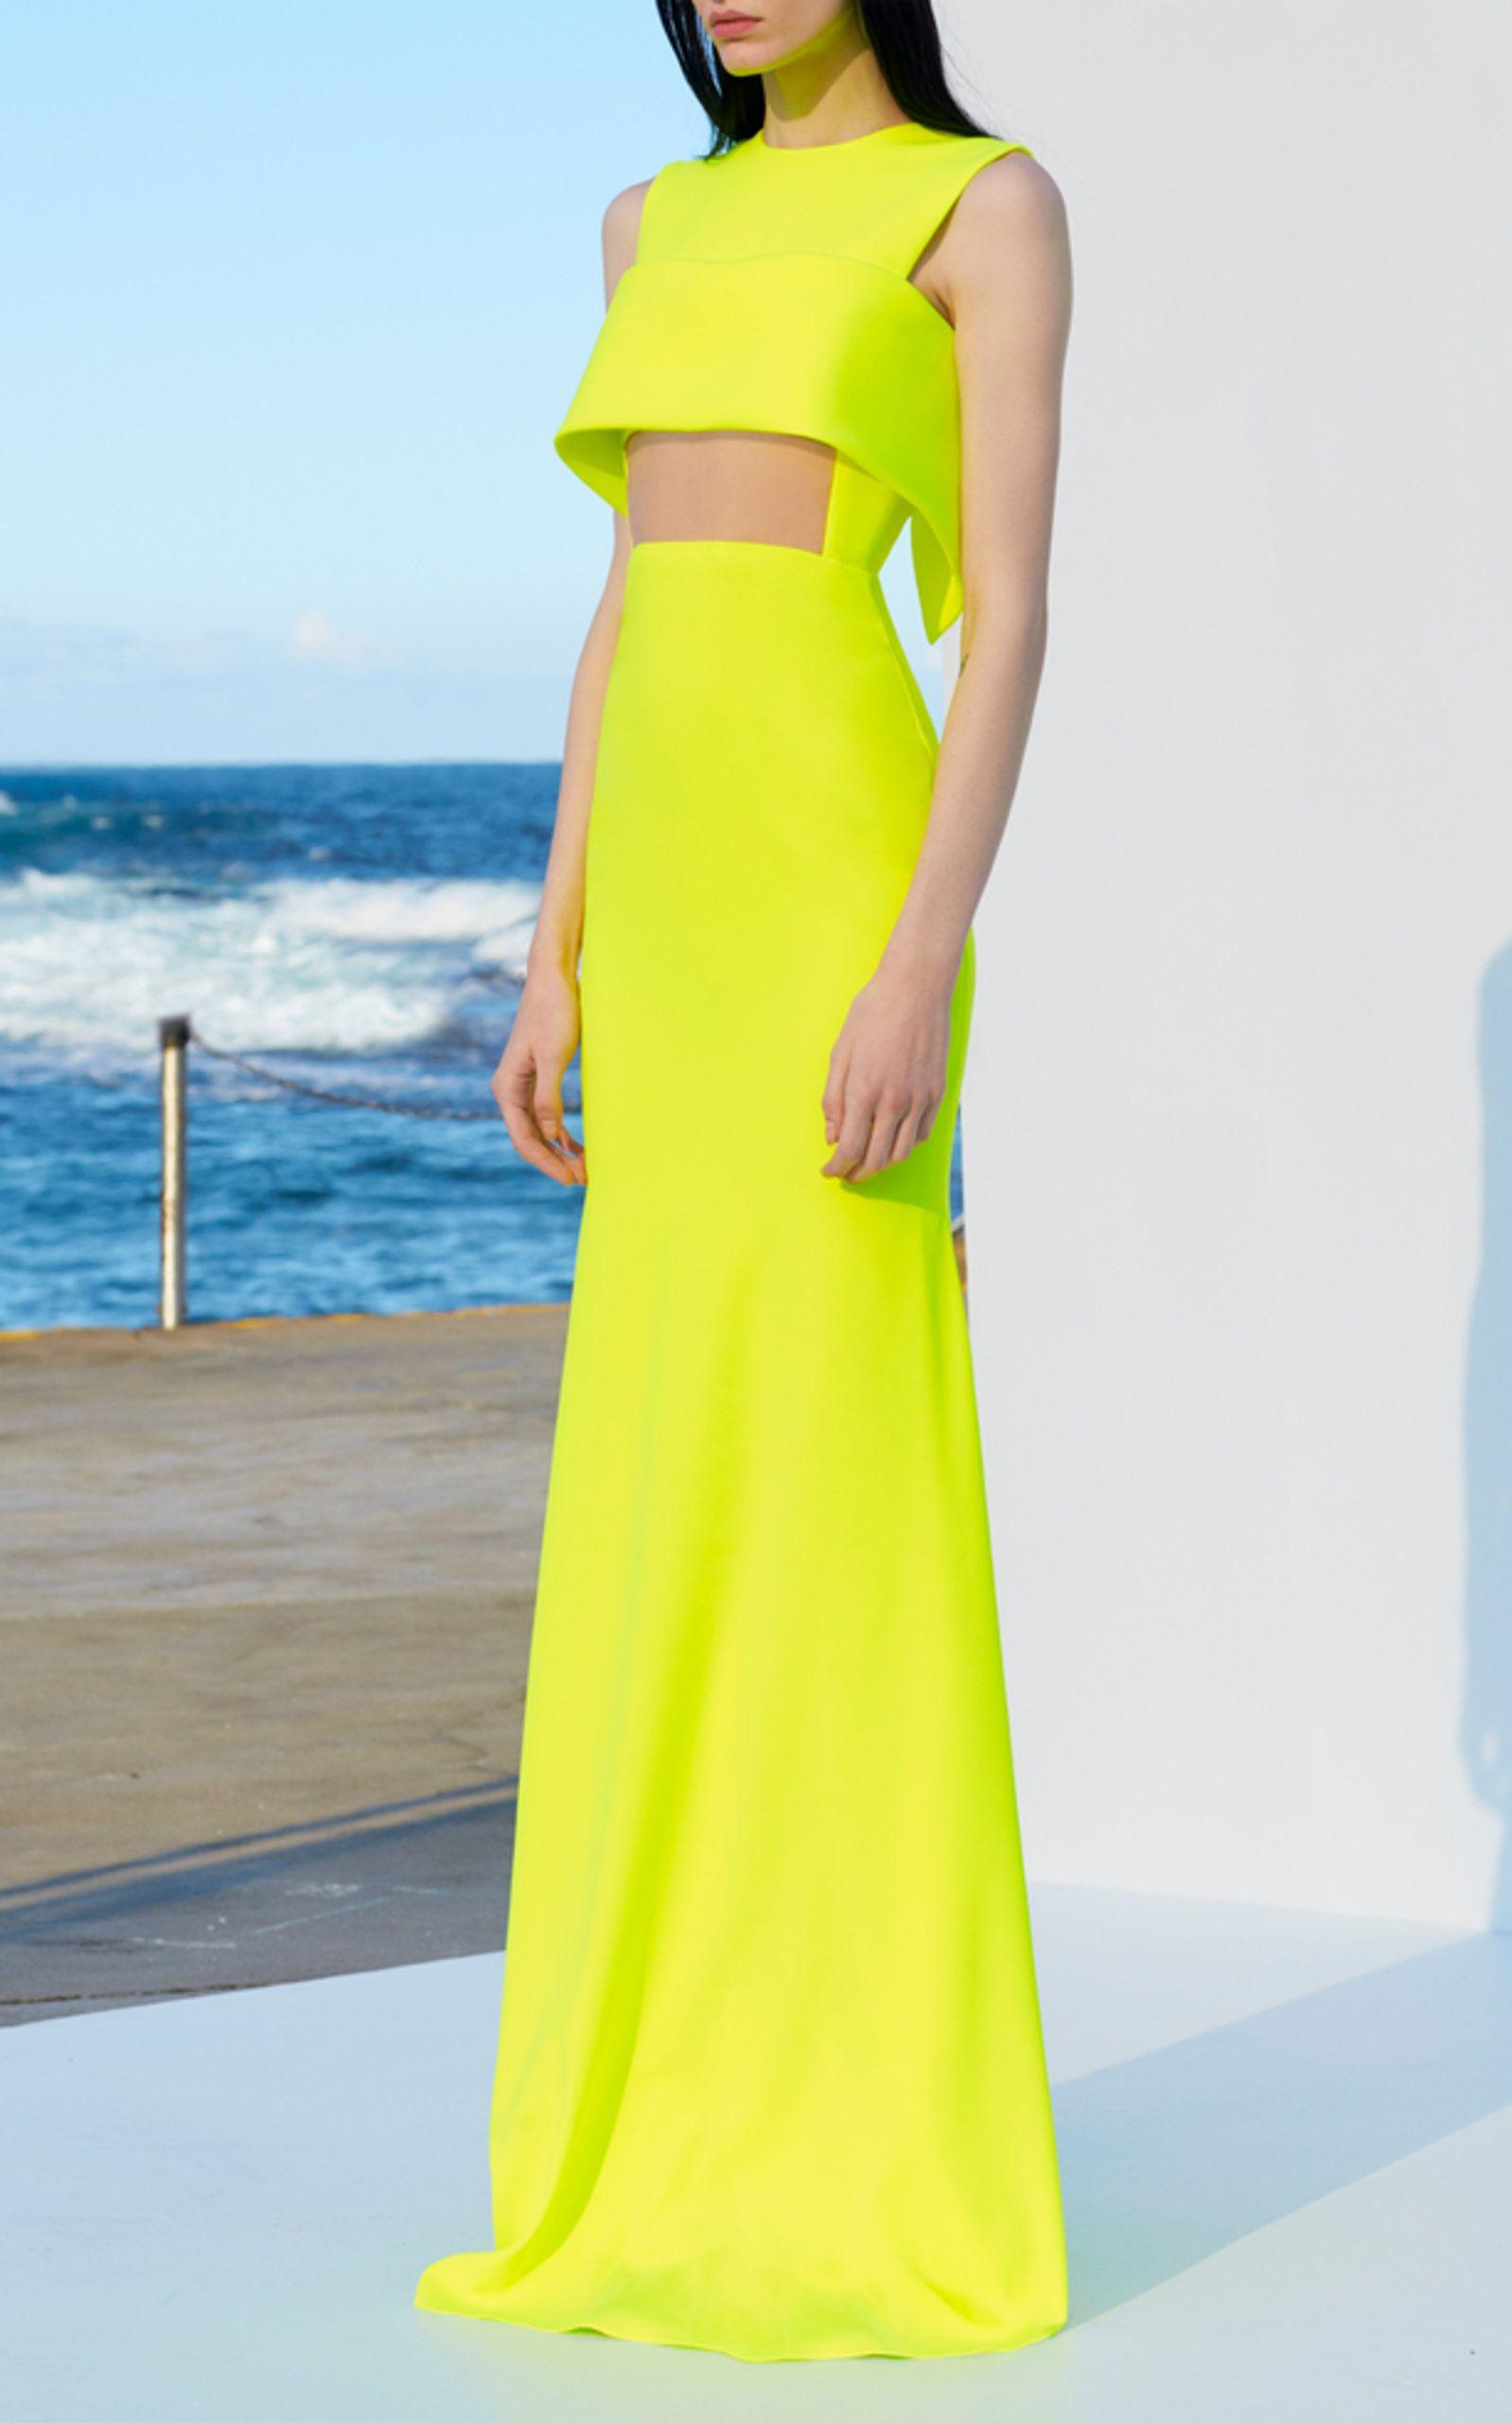 super stilvolles Kleid Neongelb